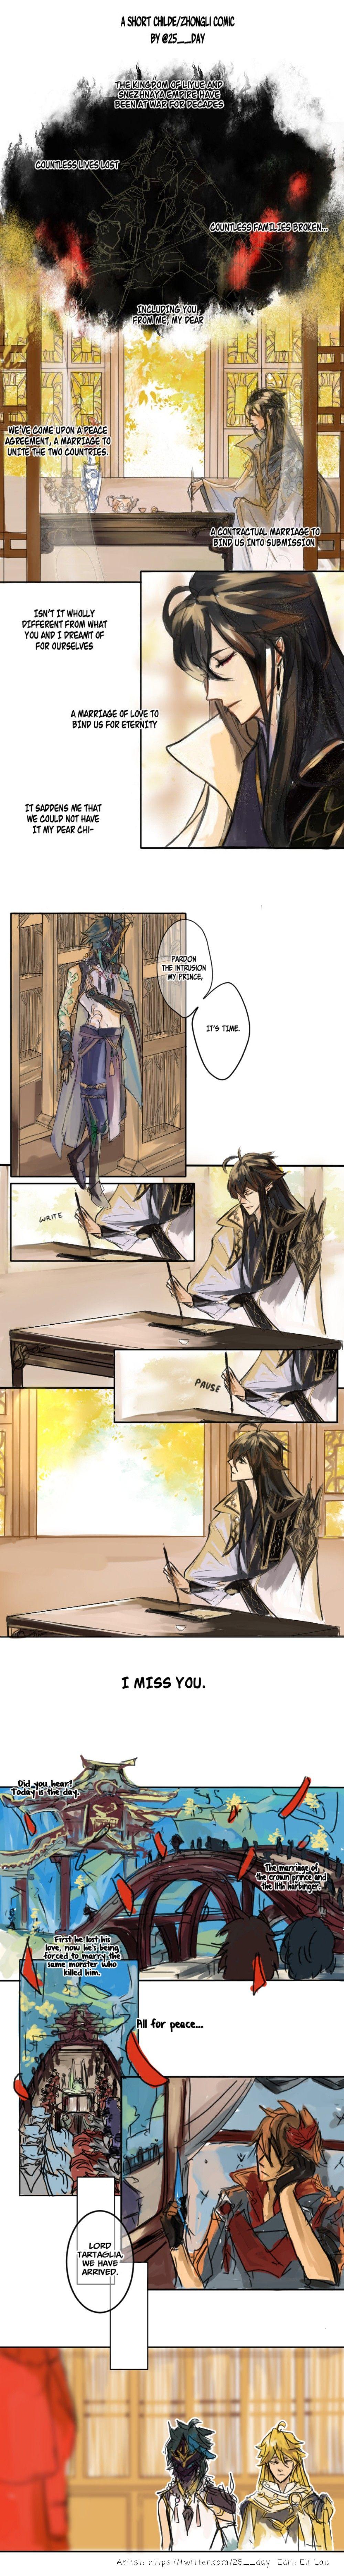 A short childe x zhongli comic 12 anime romance impact